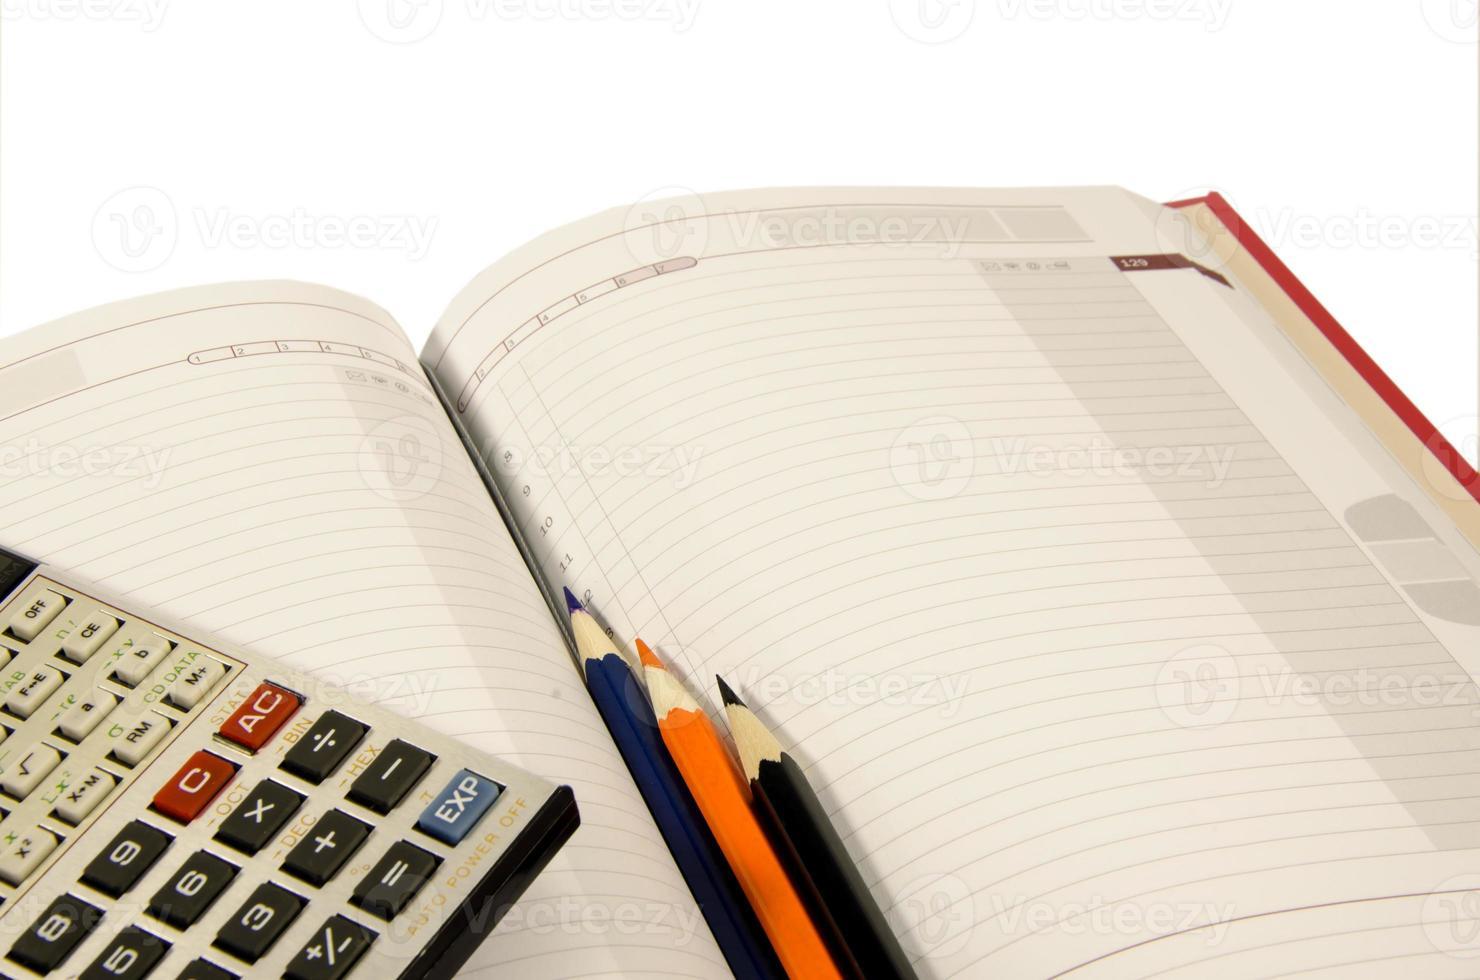 bloc-notes, calculatrice trois crayons photo